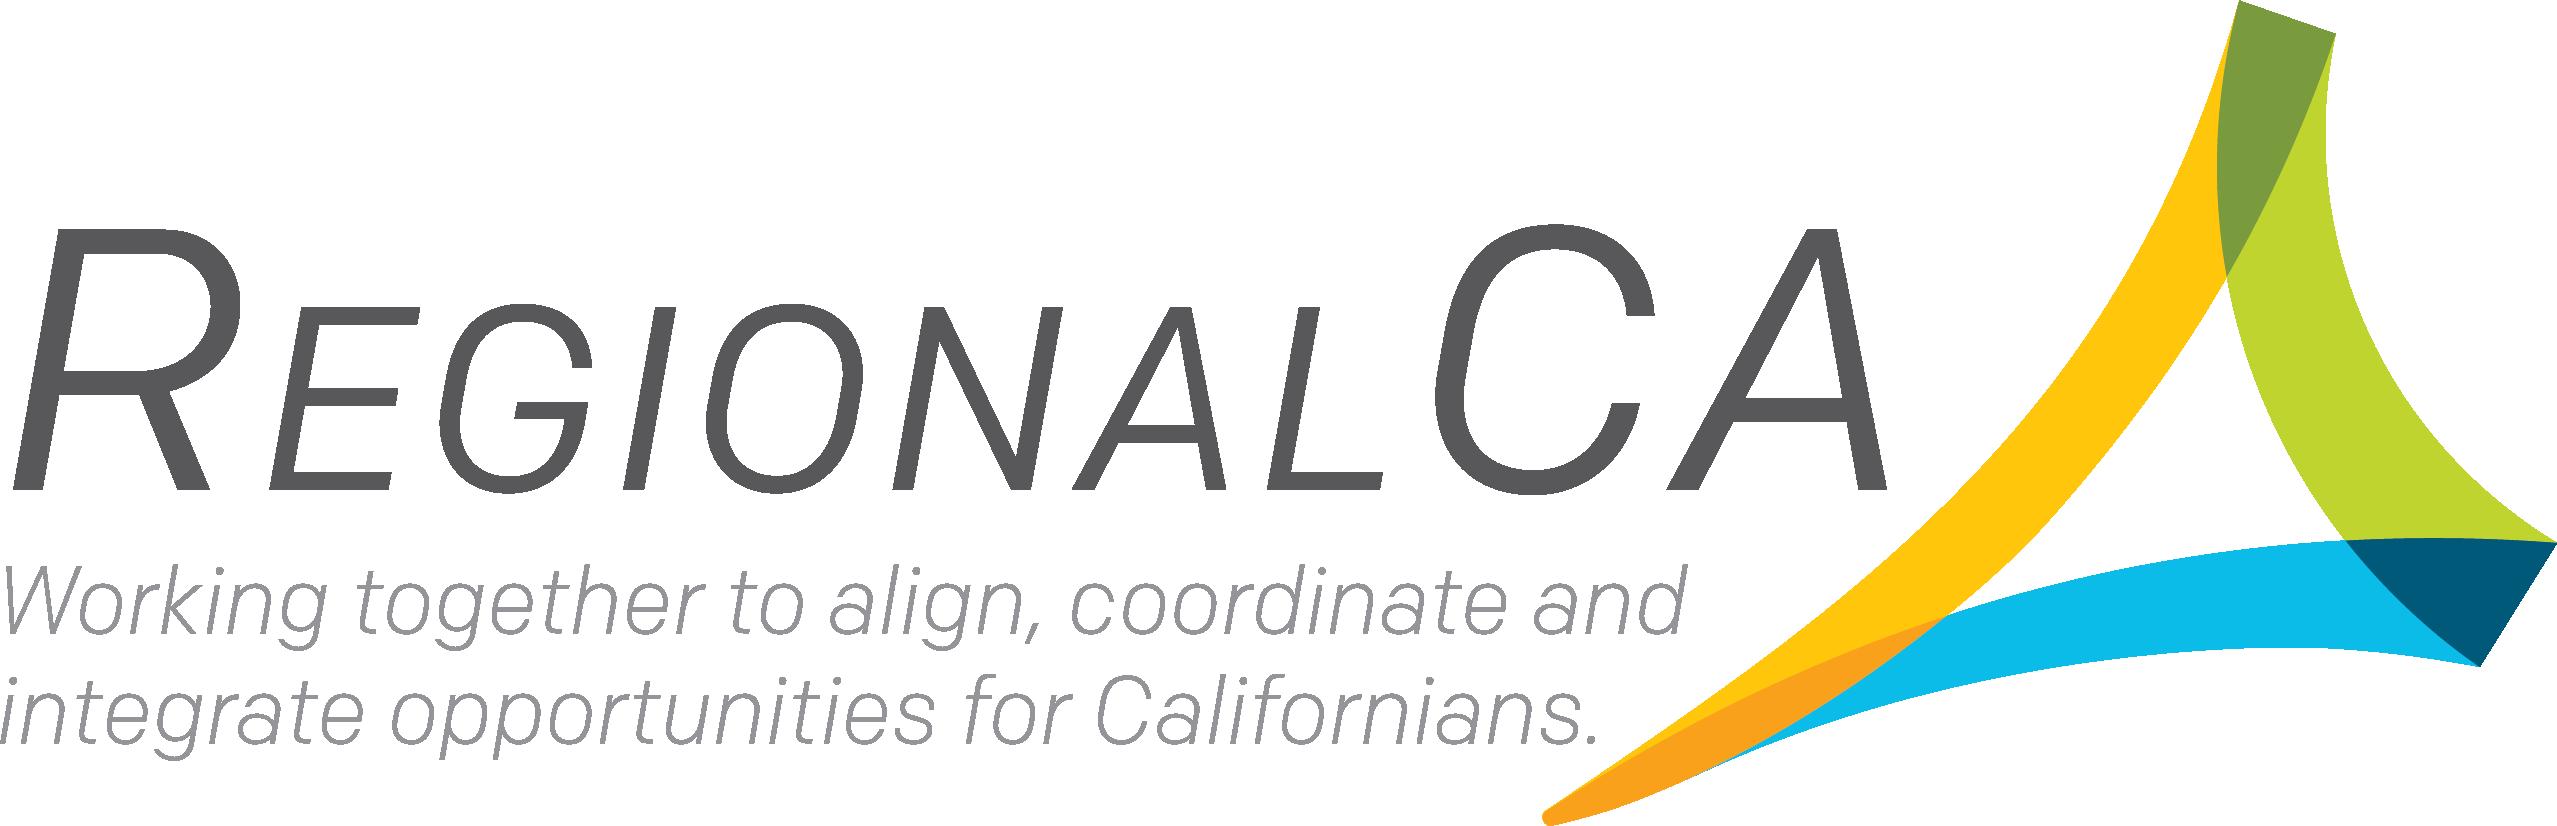 Regional California Implementation logo